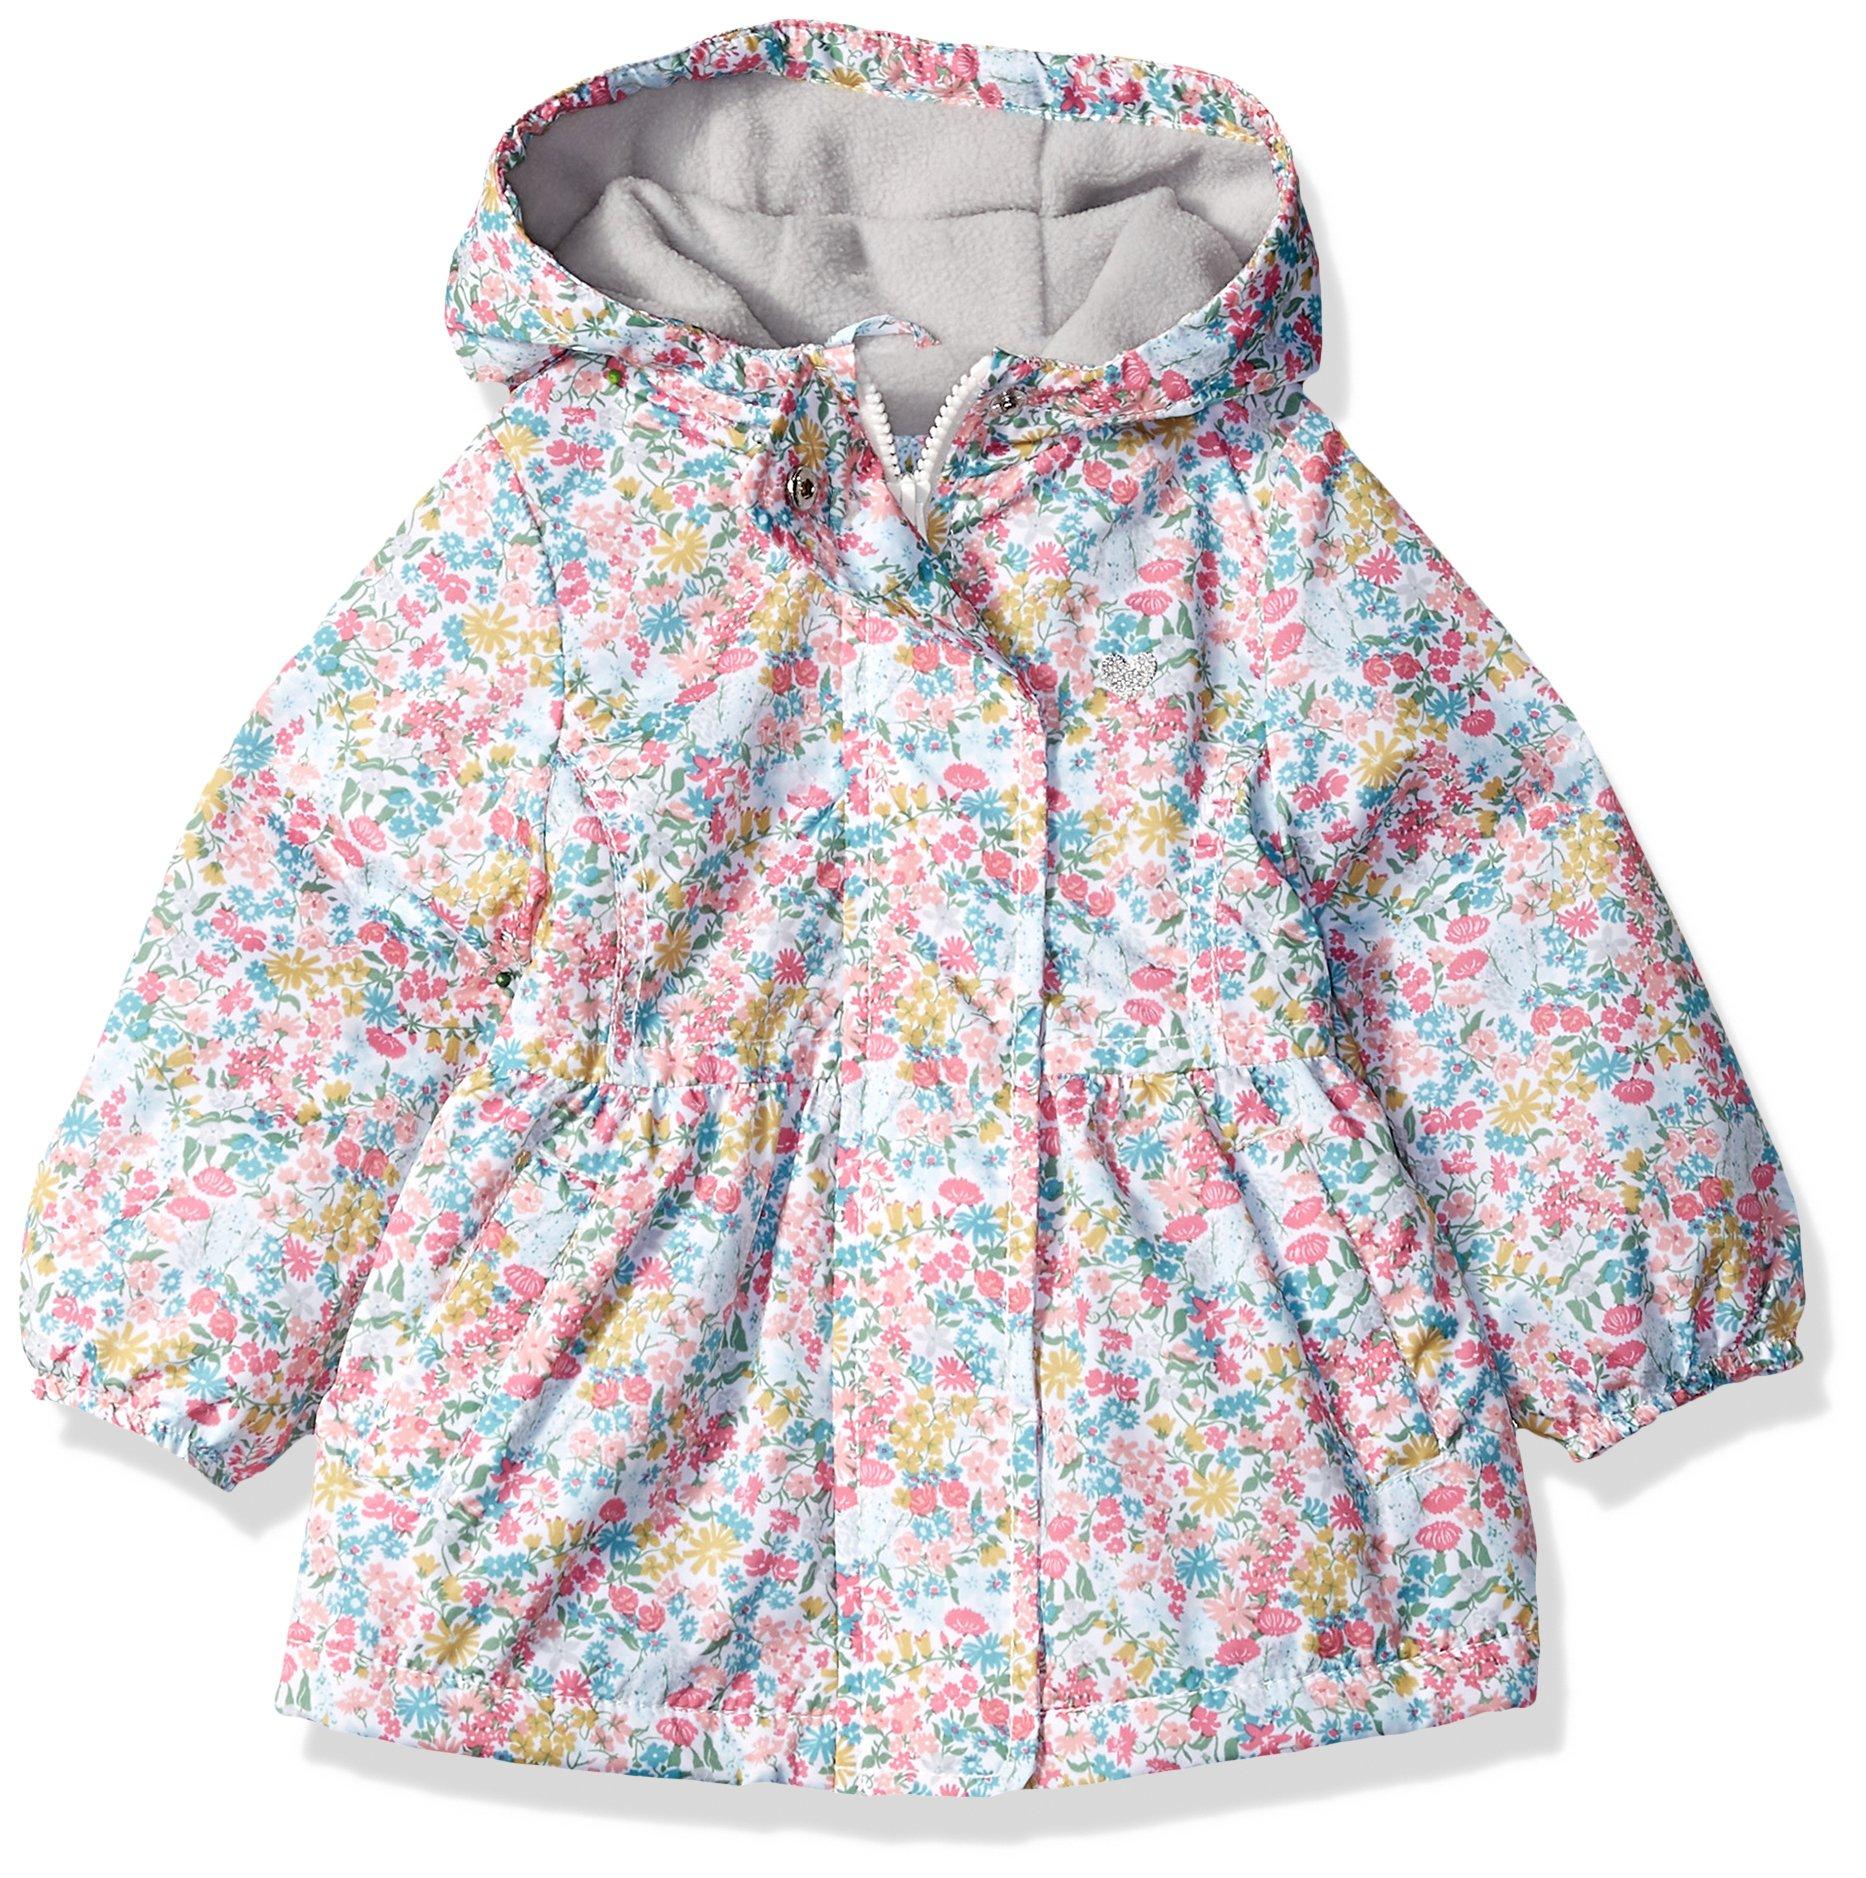 Carter's Baby Girls Midweight Fleece Lined Windbreaker, Ditsy Floral, 12M